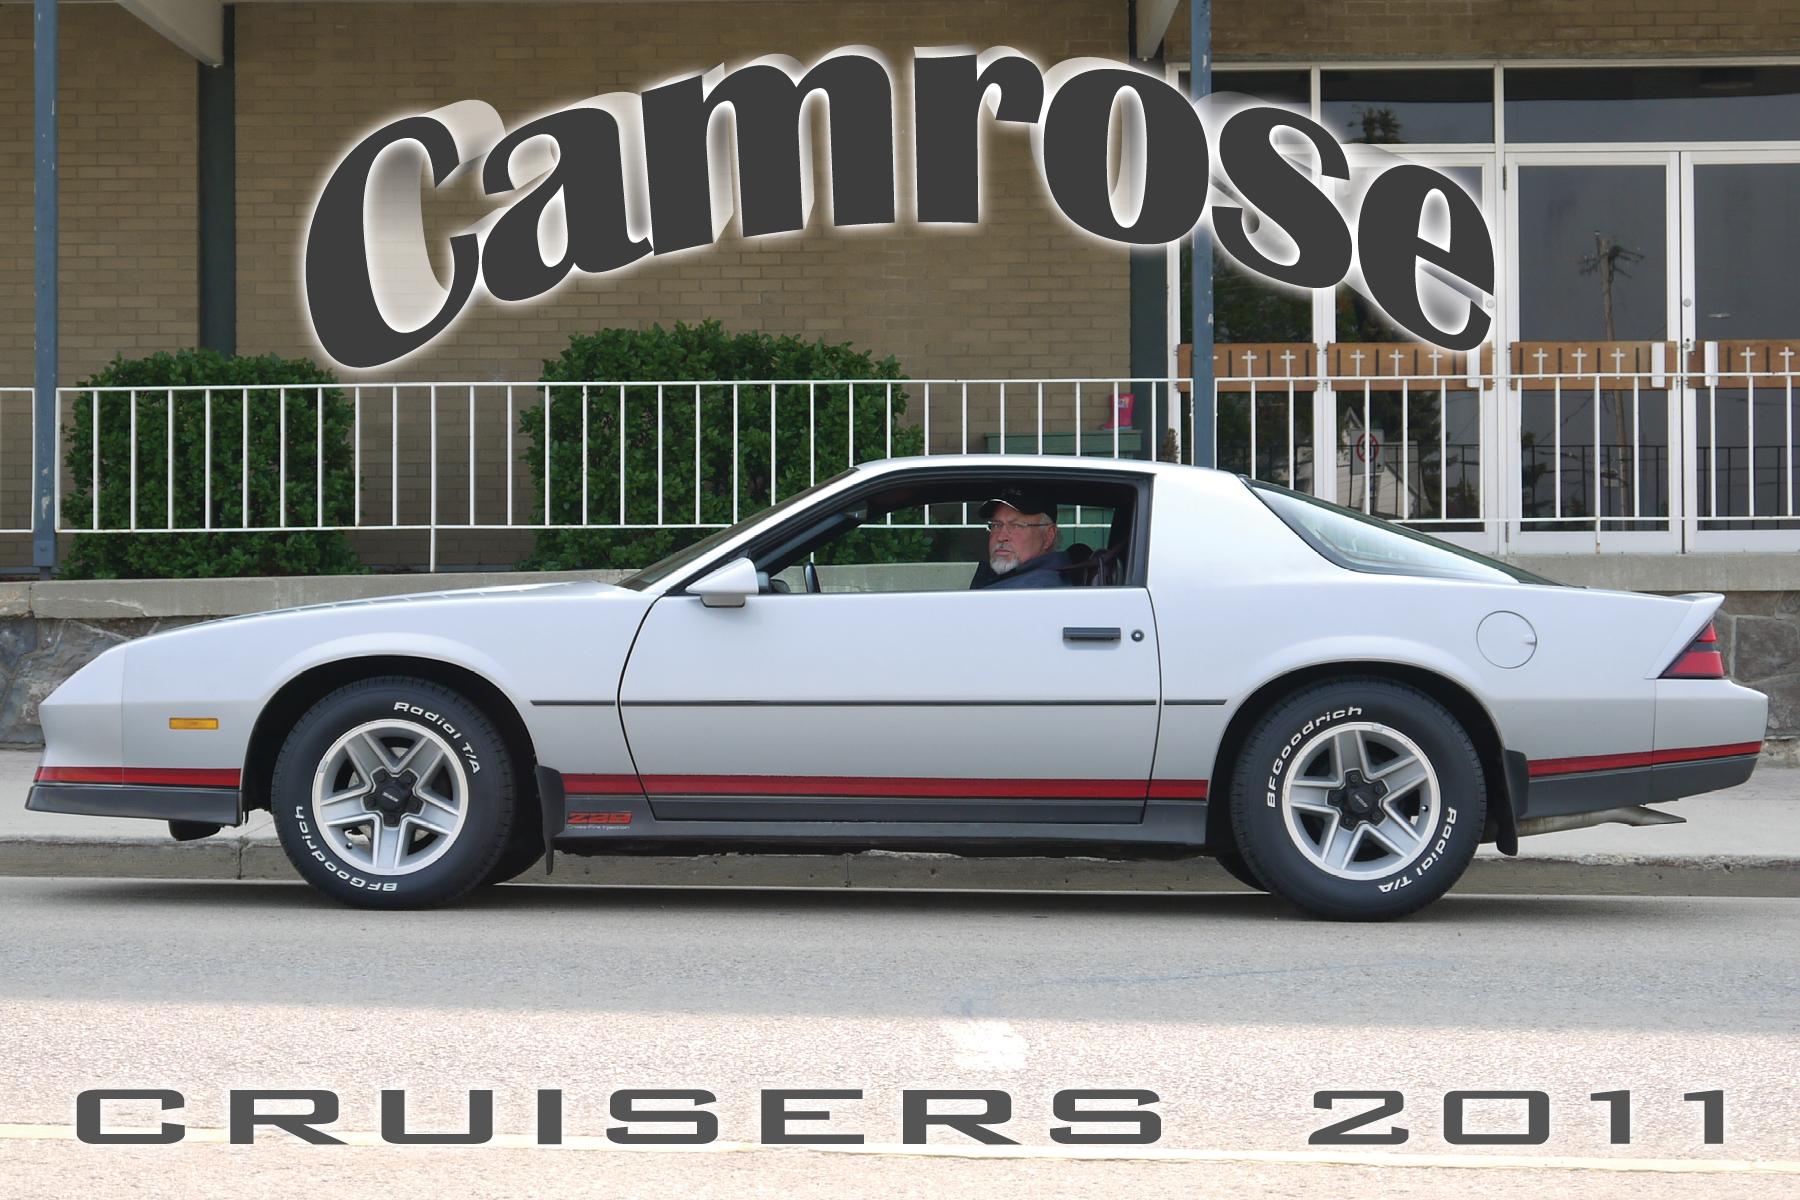 20110528_CamCruisers23.jpg